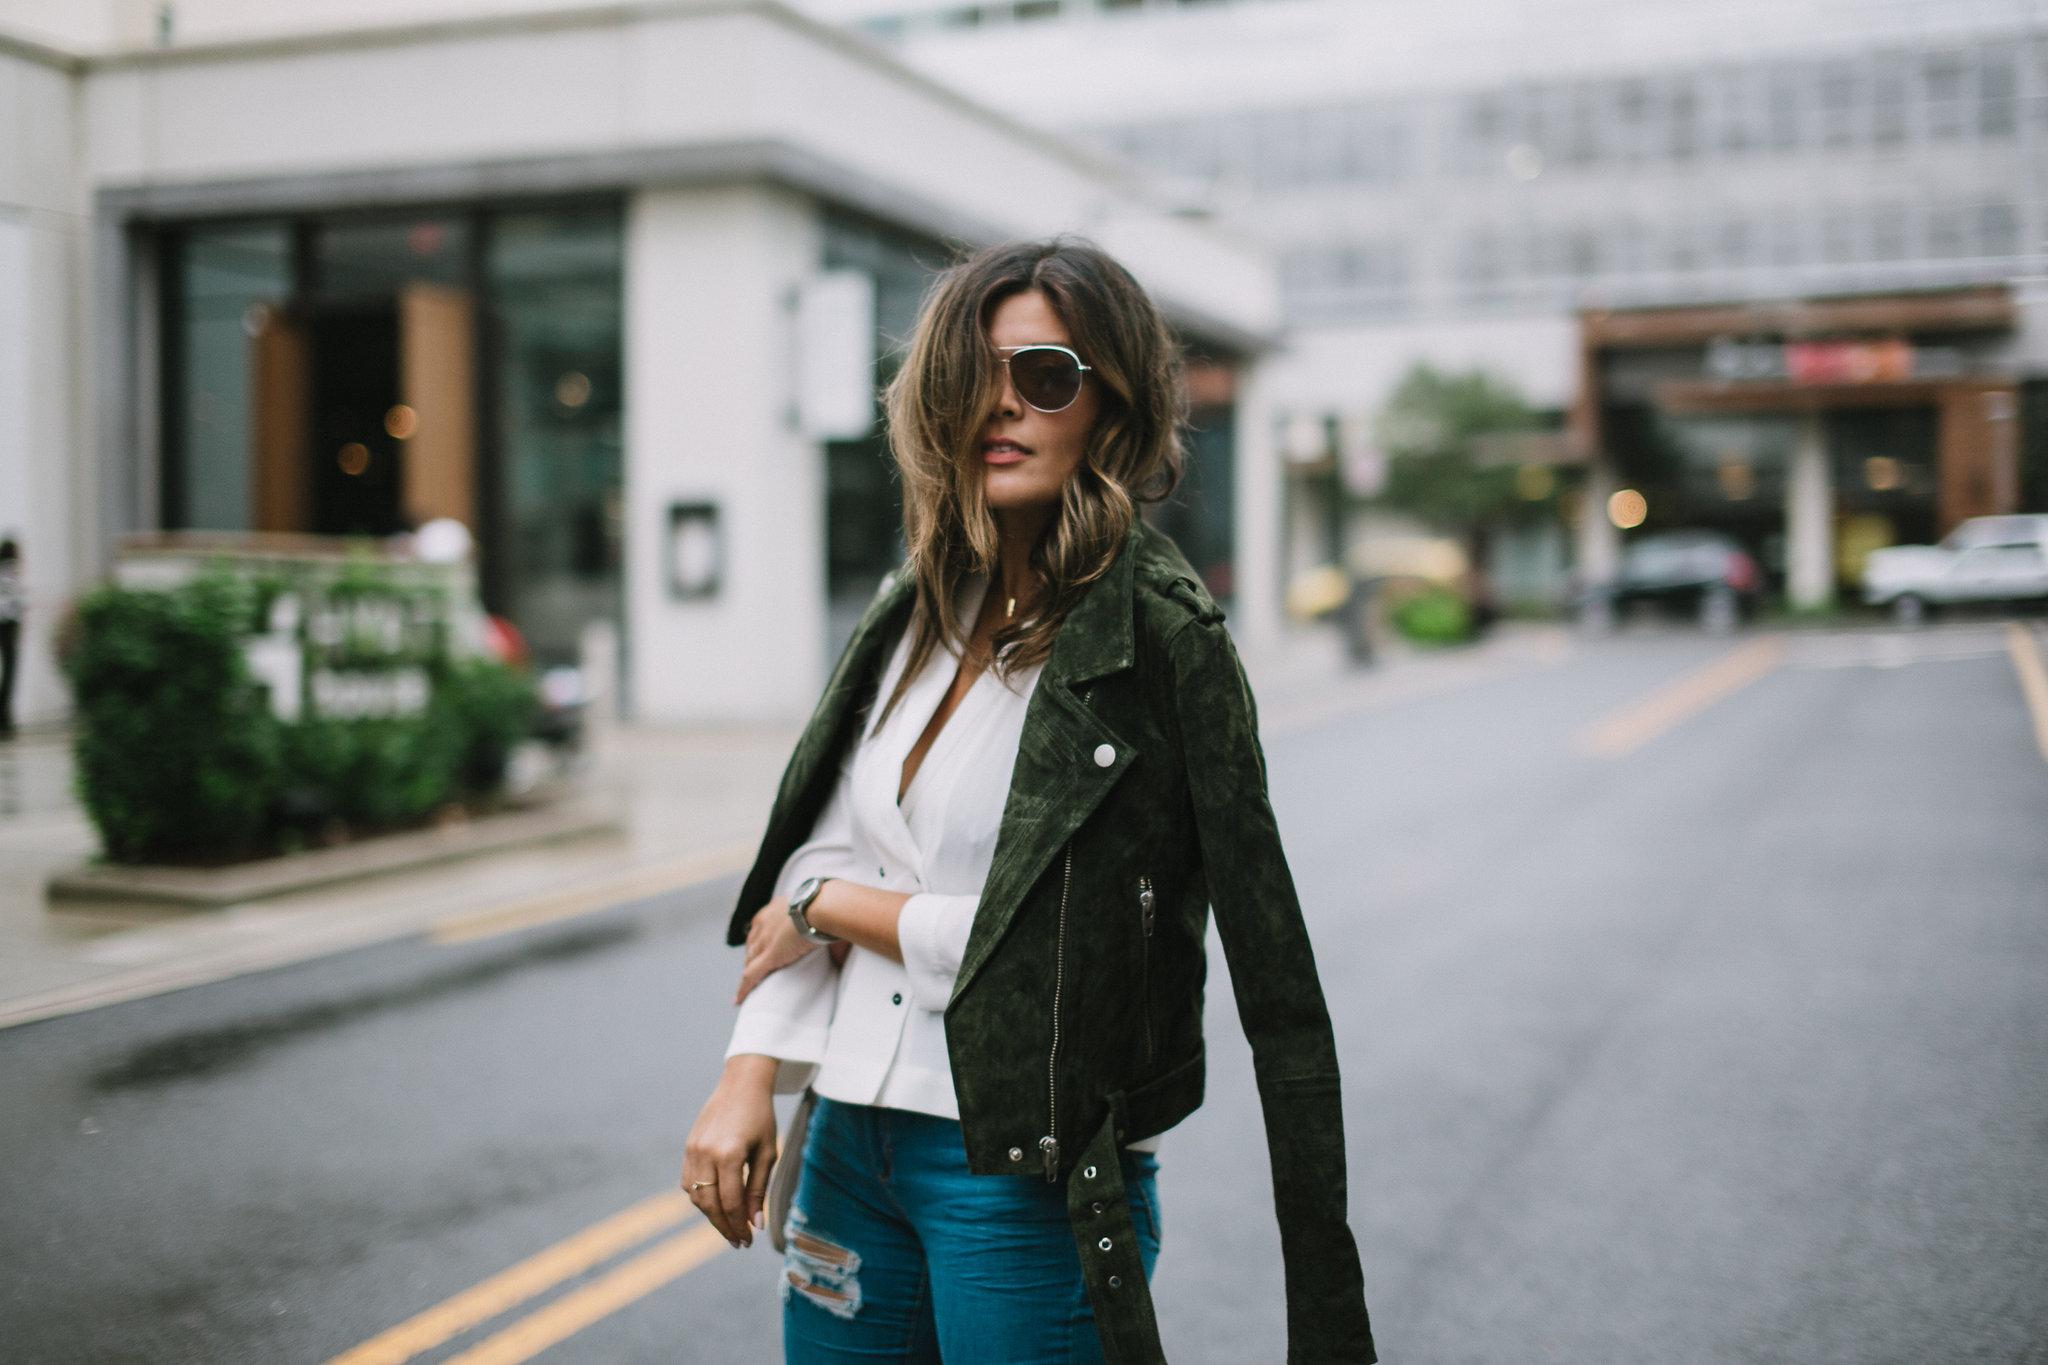 Style MBA wears Nordstrom Suede Moto Jacket